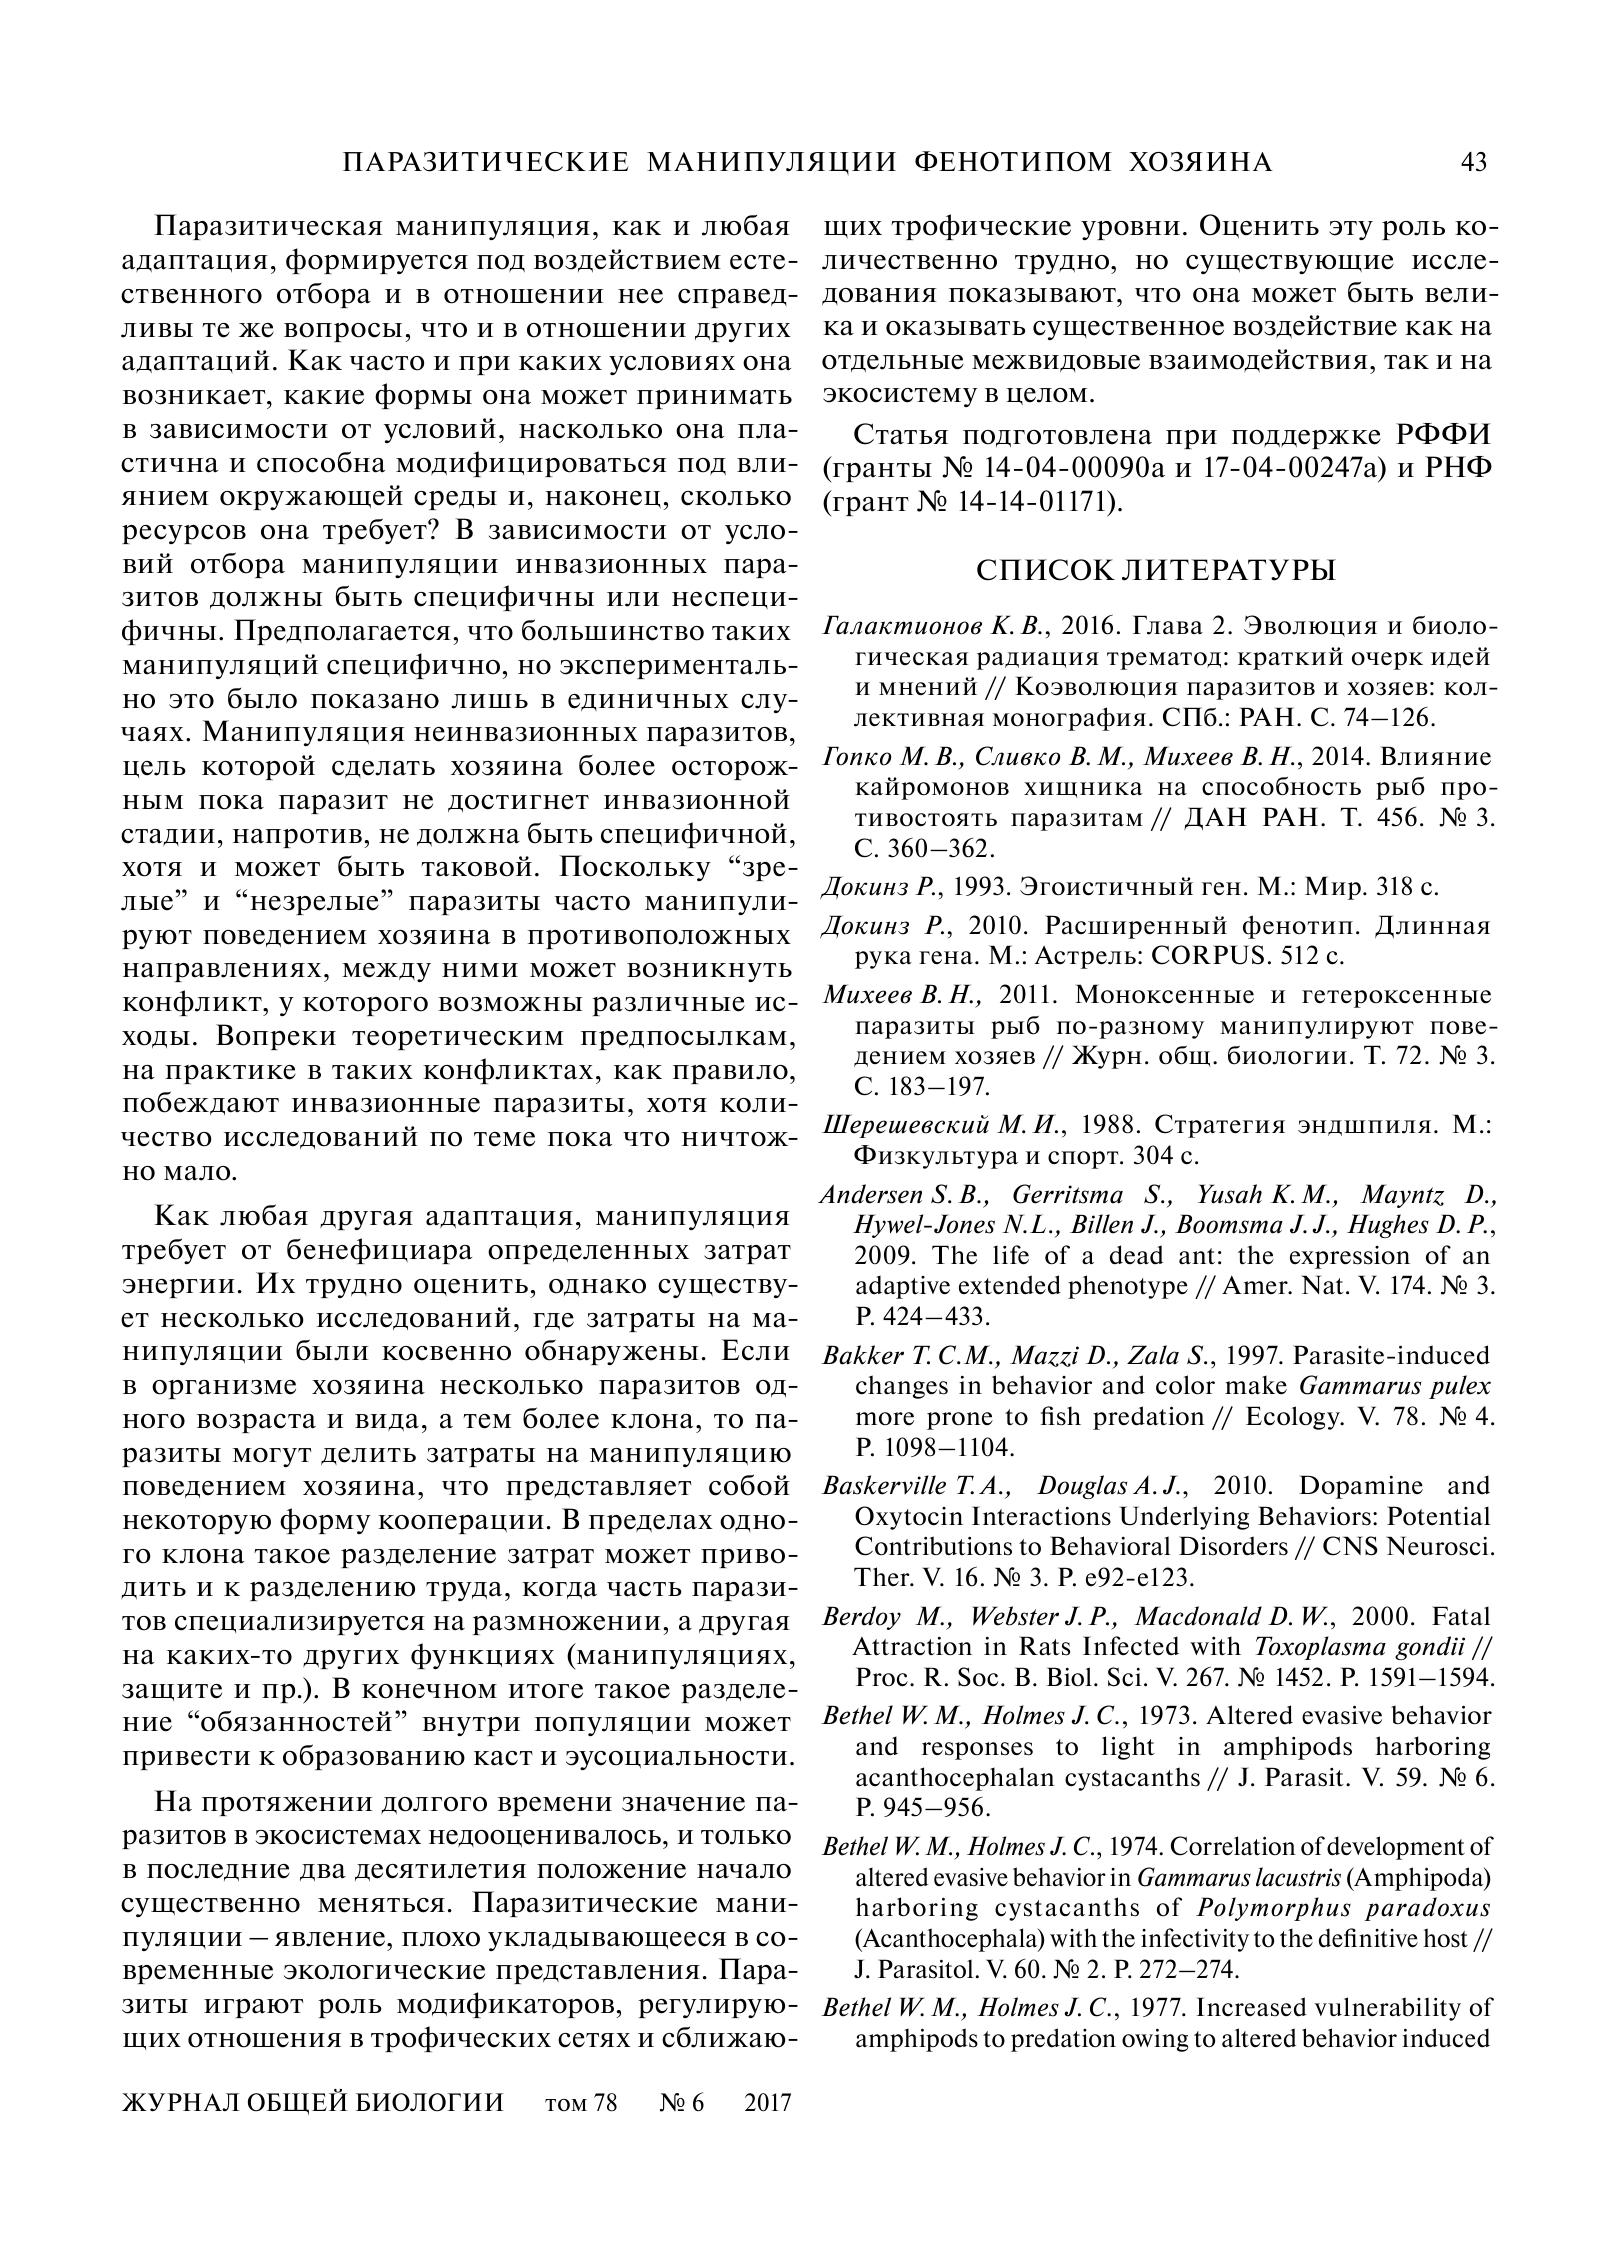 pdf_page_image-00028